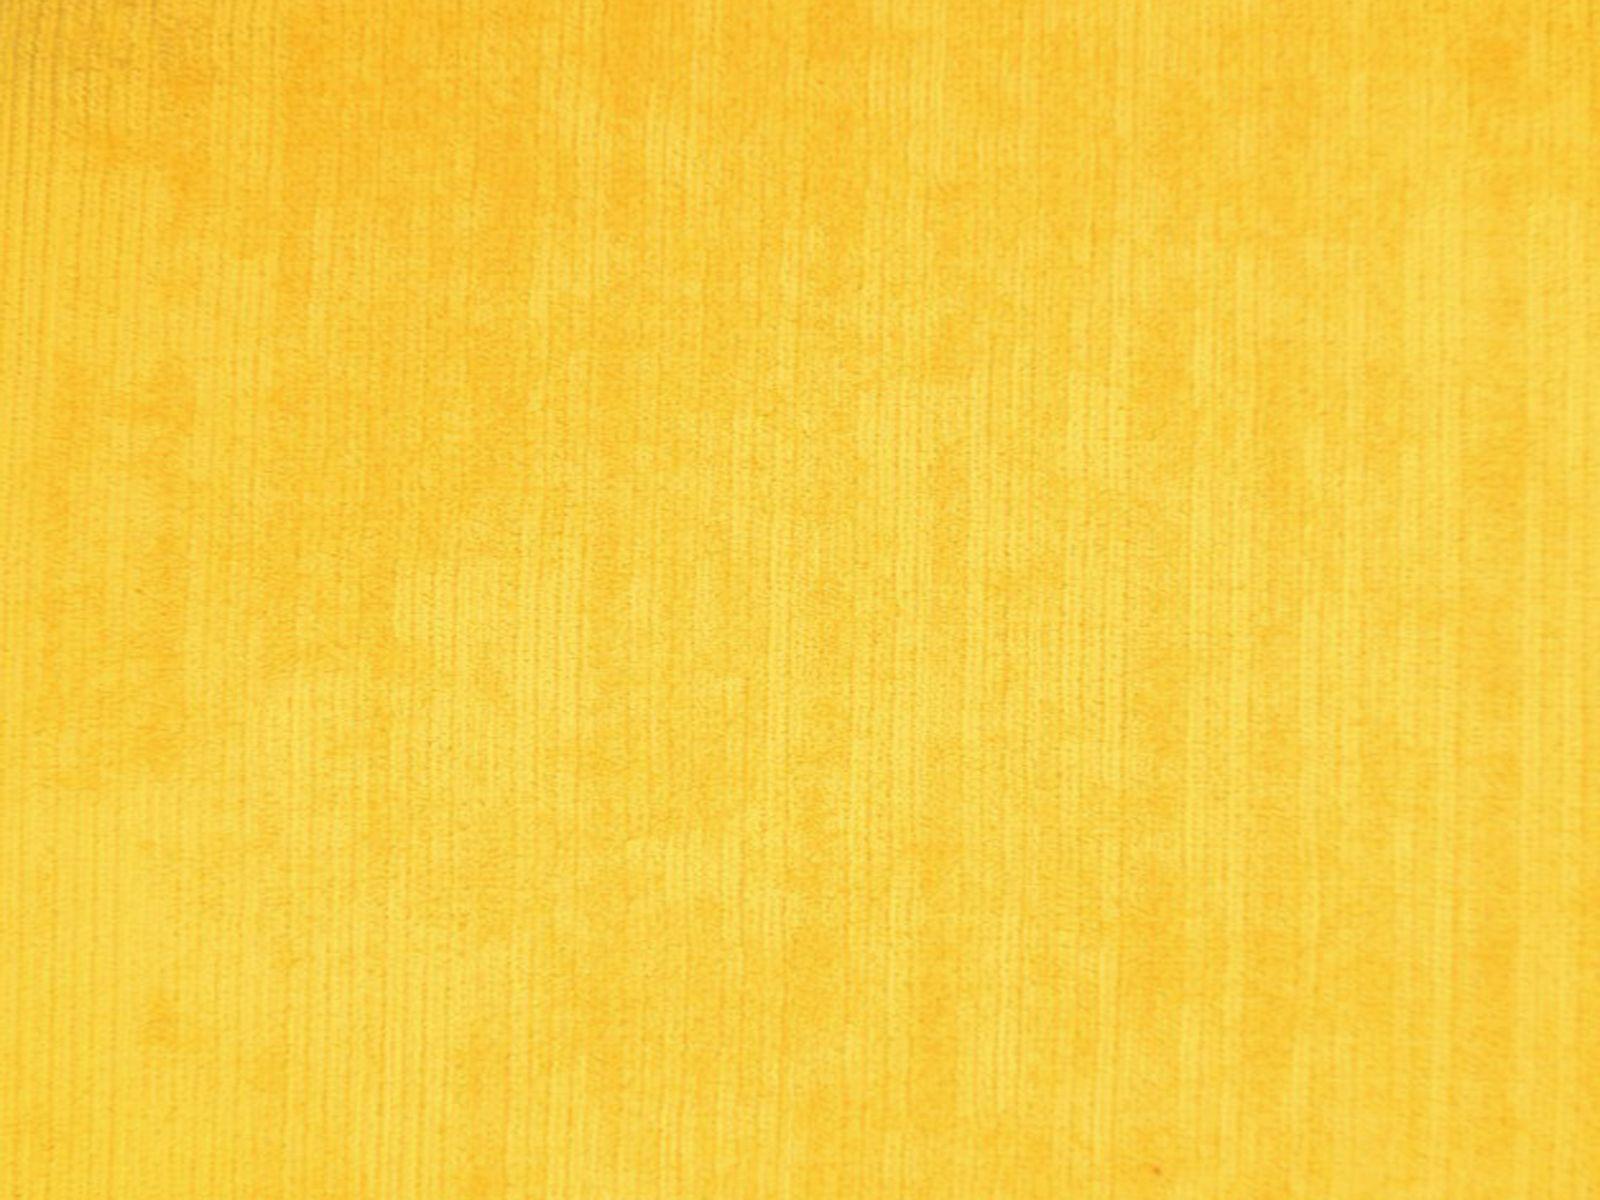 Modelli Fabrics Assisi 2018 Acid Yellow Velvet Donut Shop